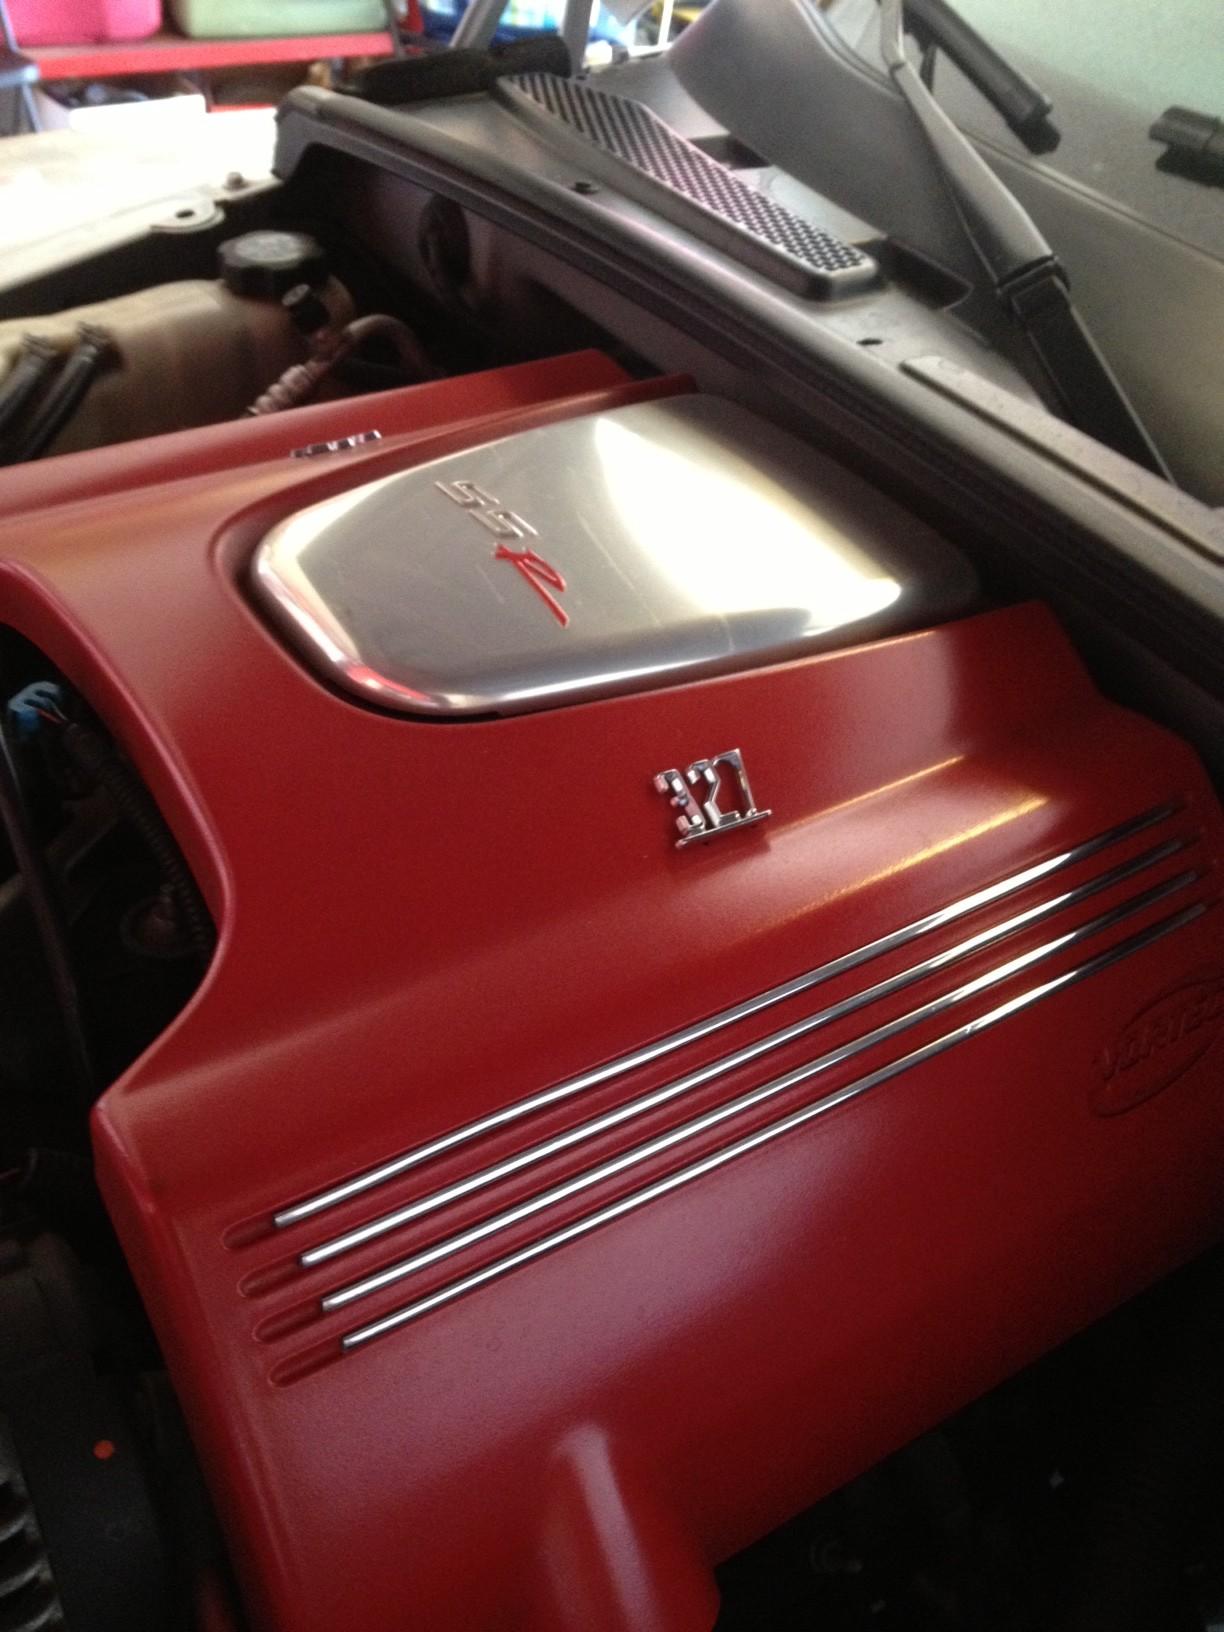 327 Emblems-327-emblem.jpg